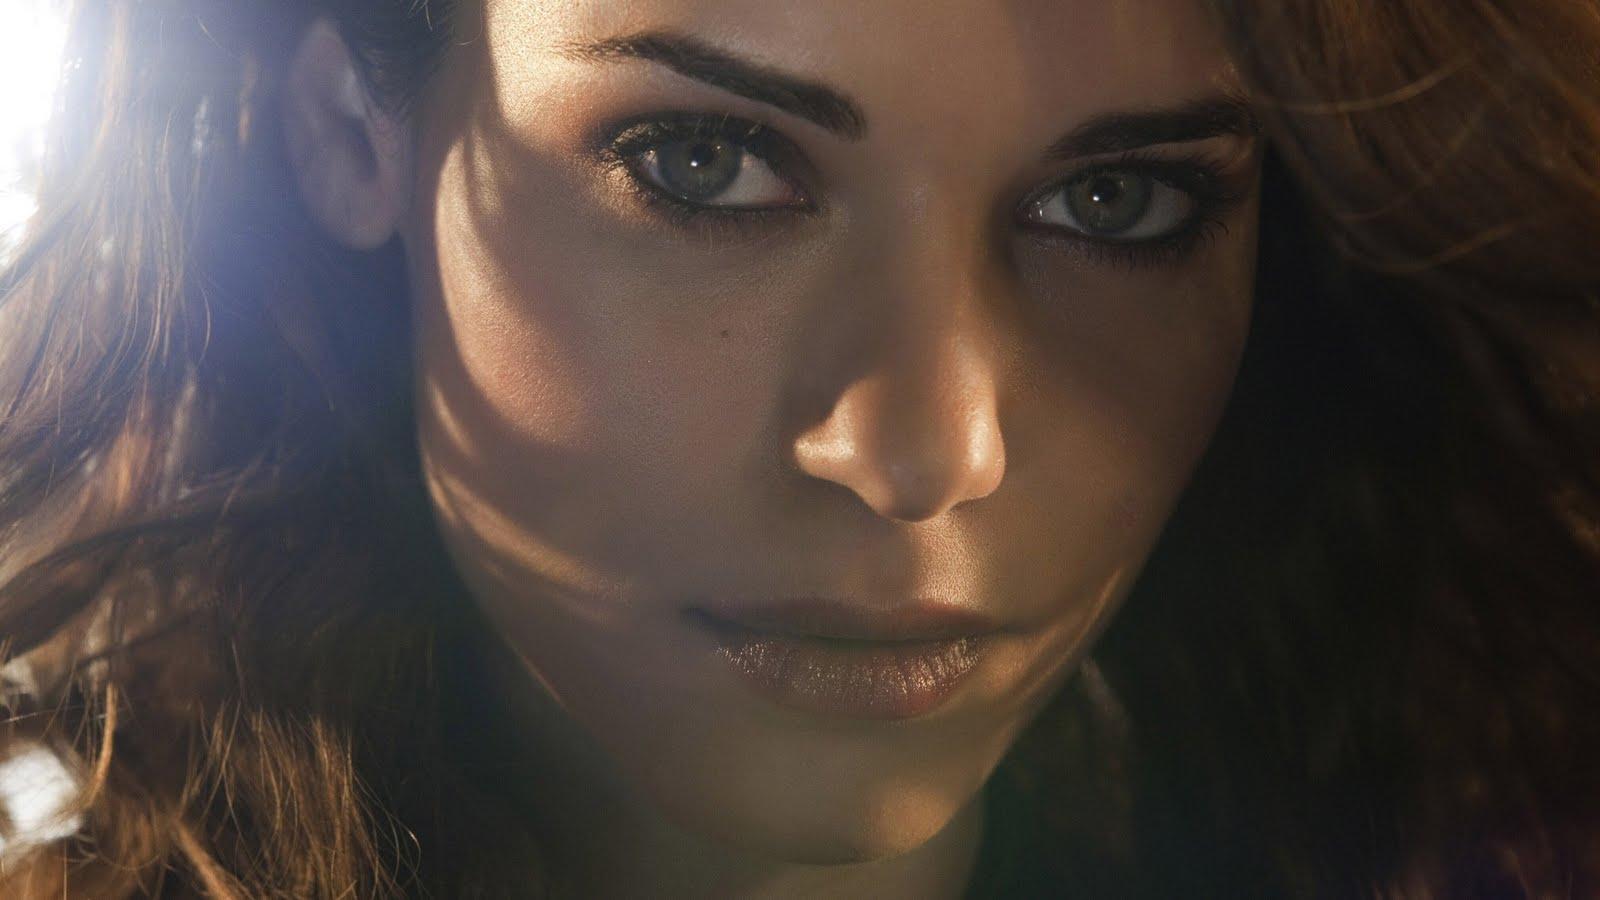 lyndsy-fonseca-beautiful-eyes